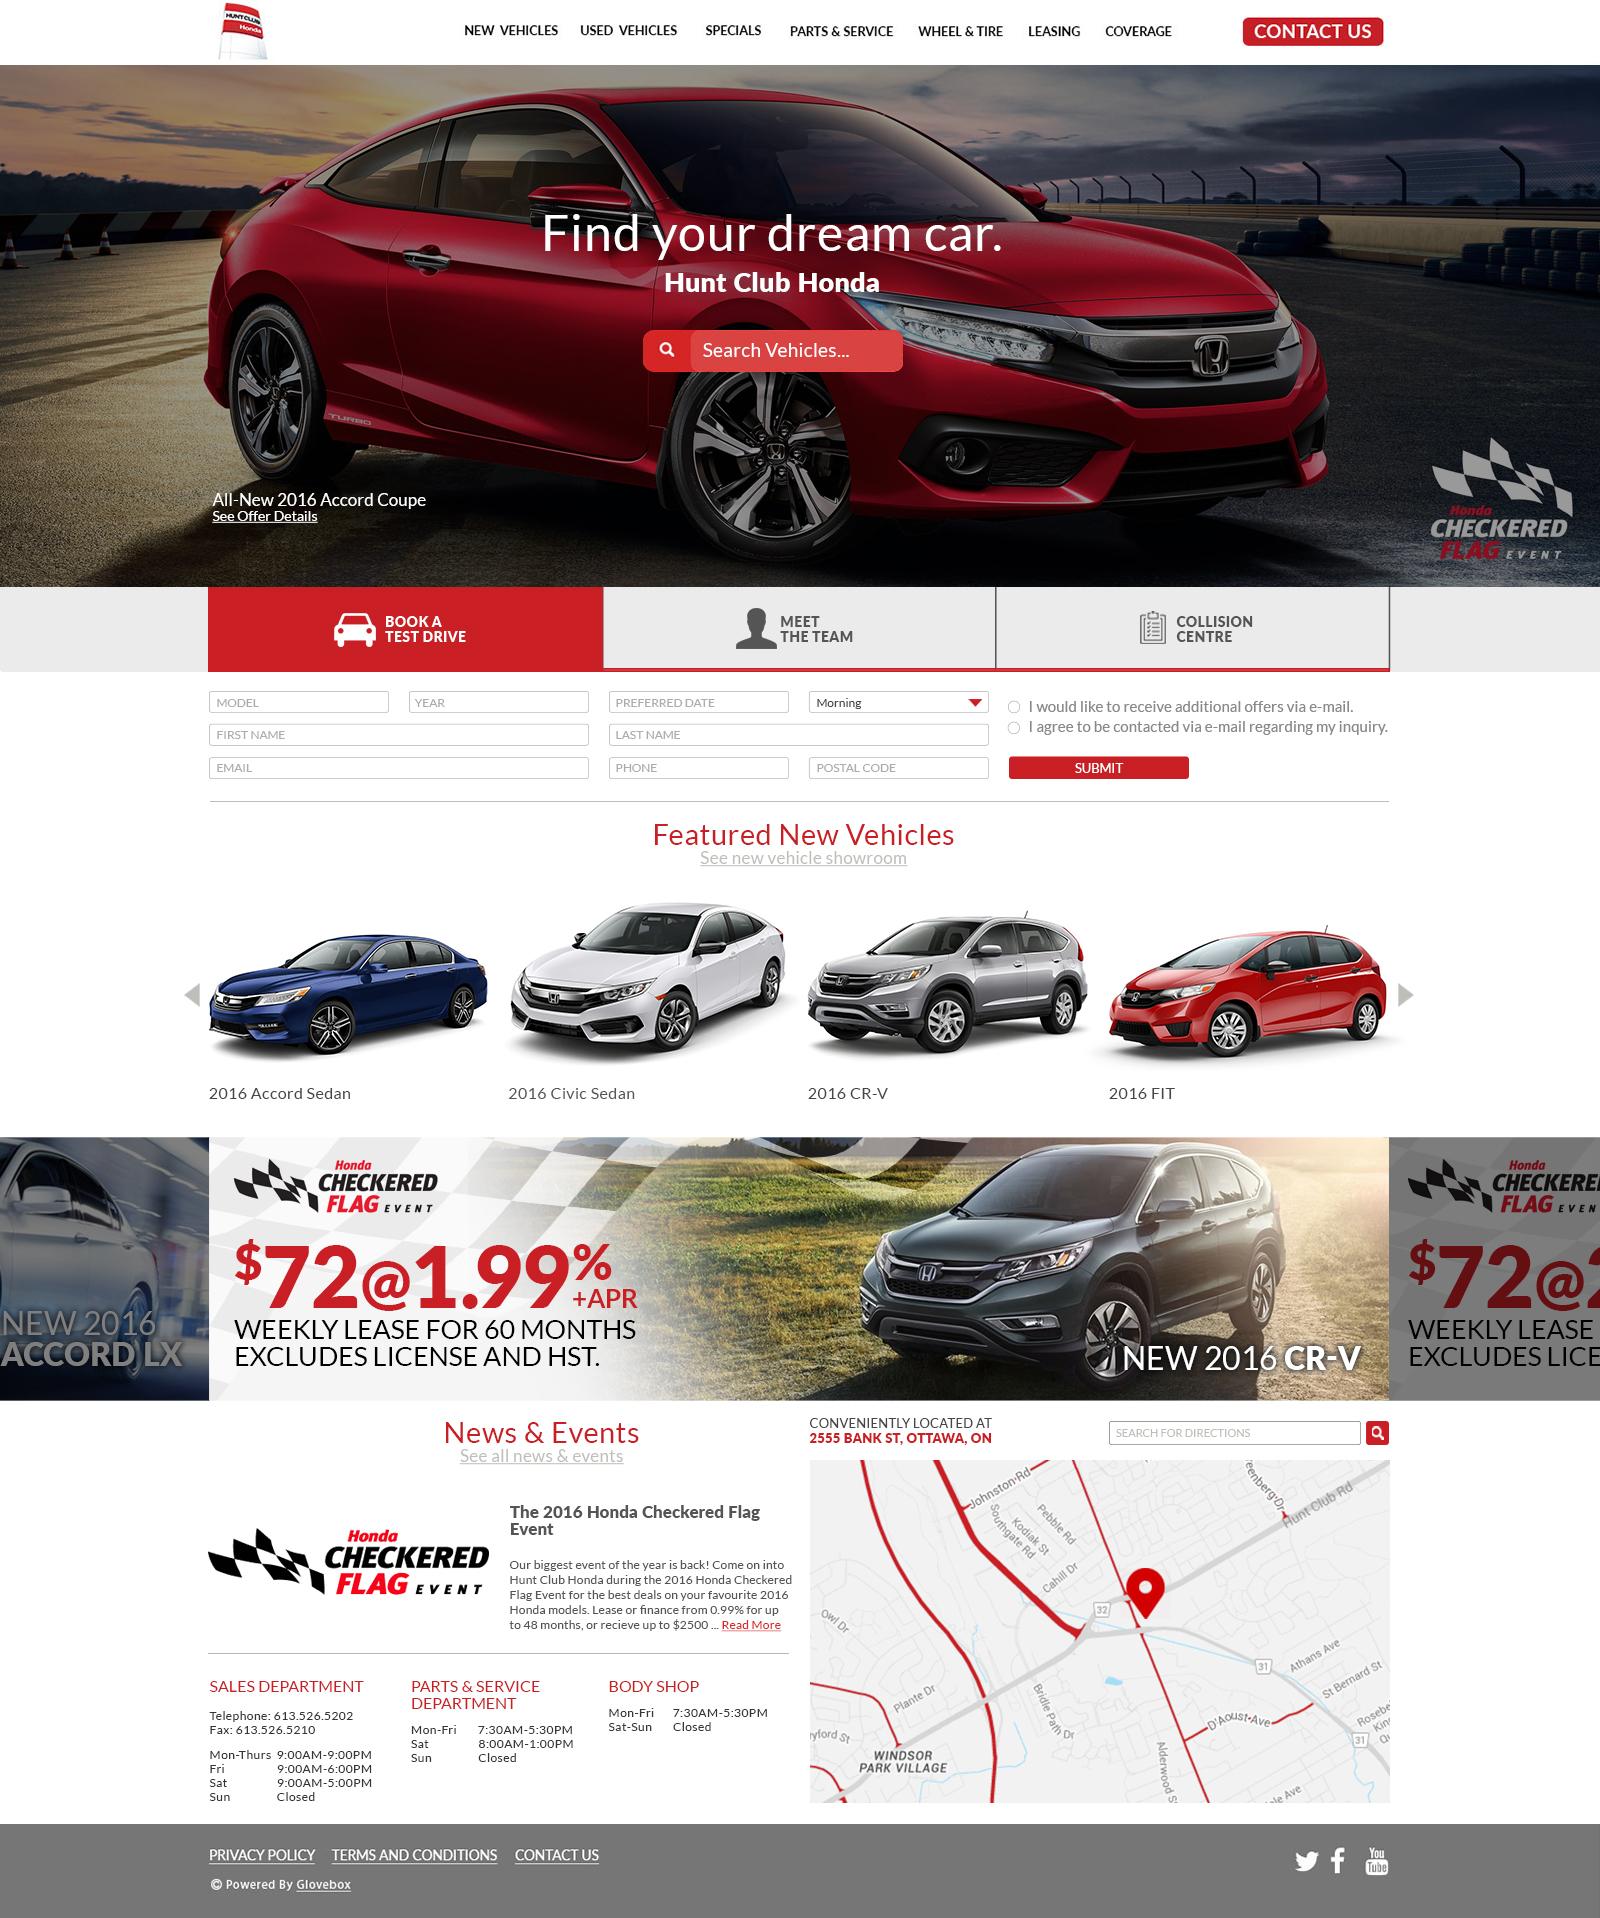 HCH_Homepage_16001.jpg